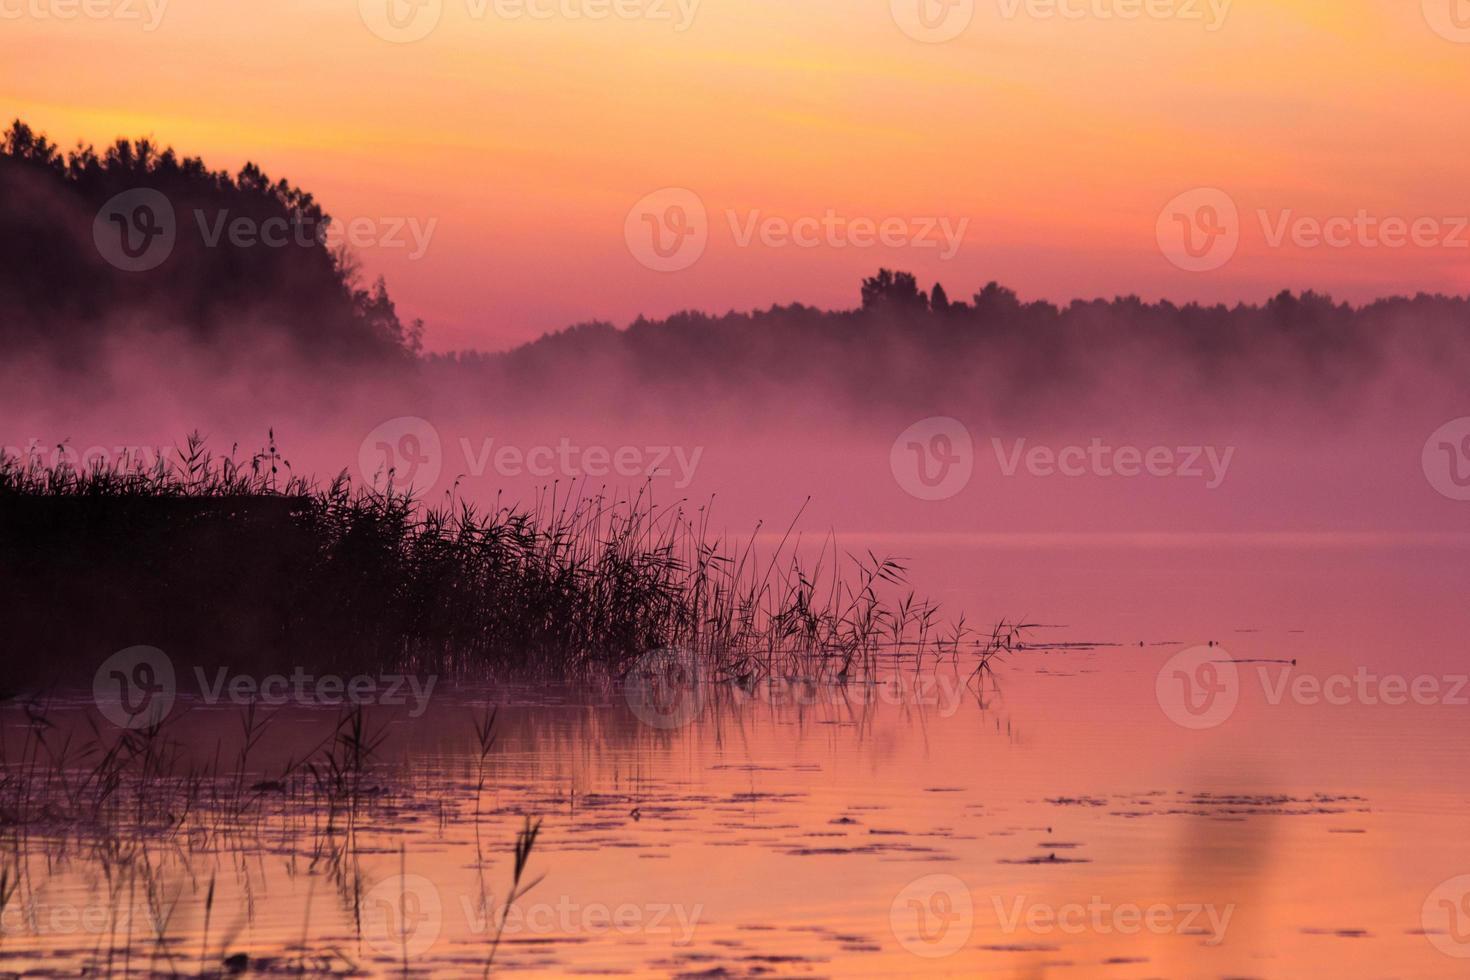 Sunrise over the lake photo